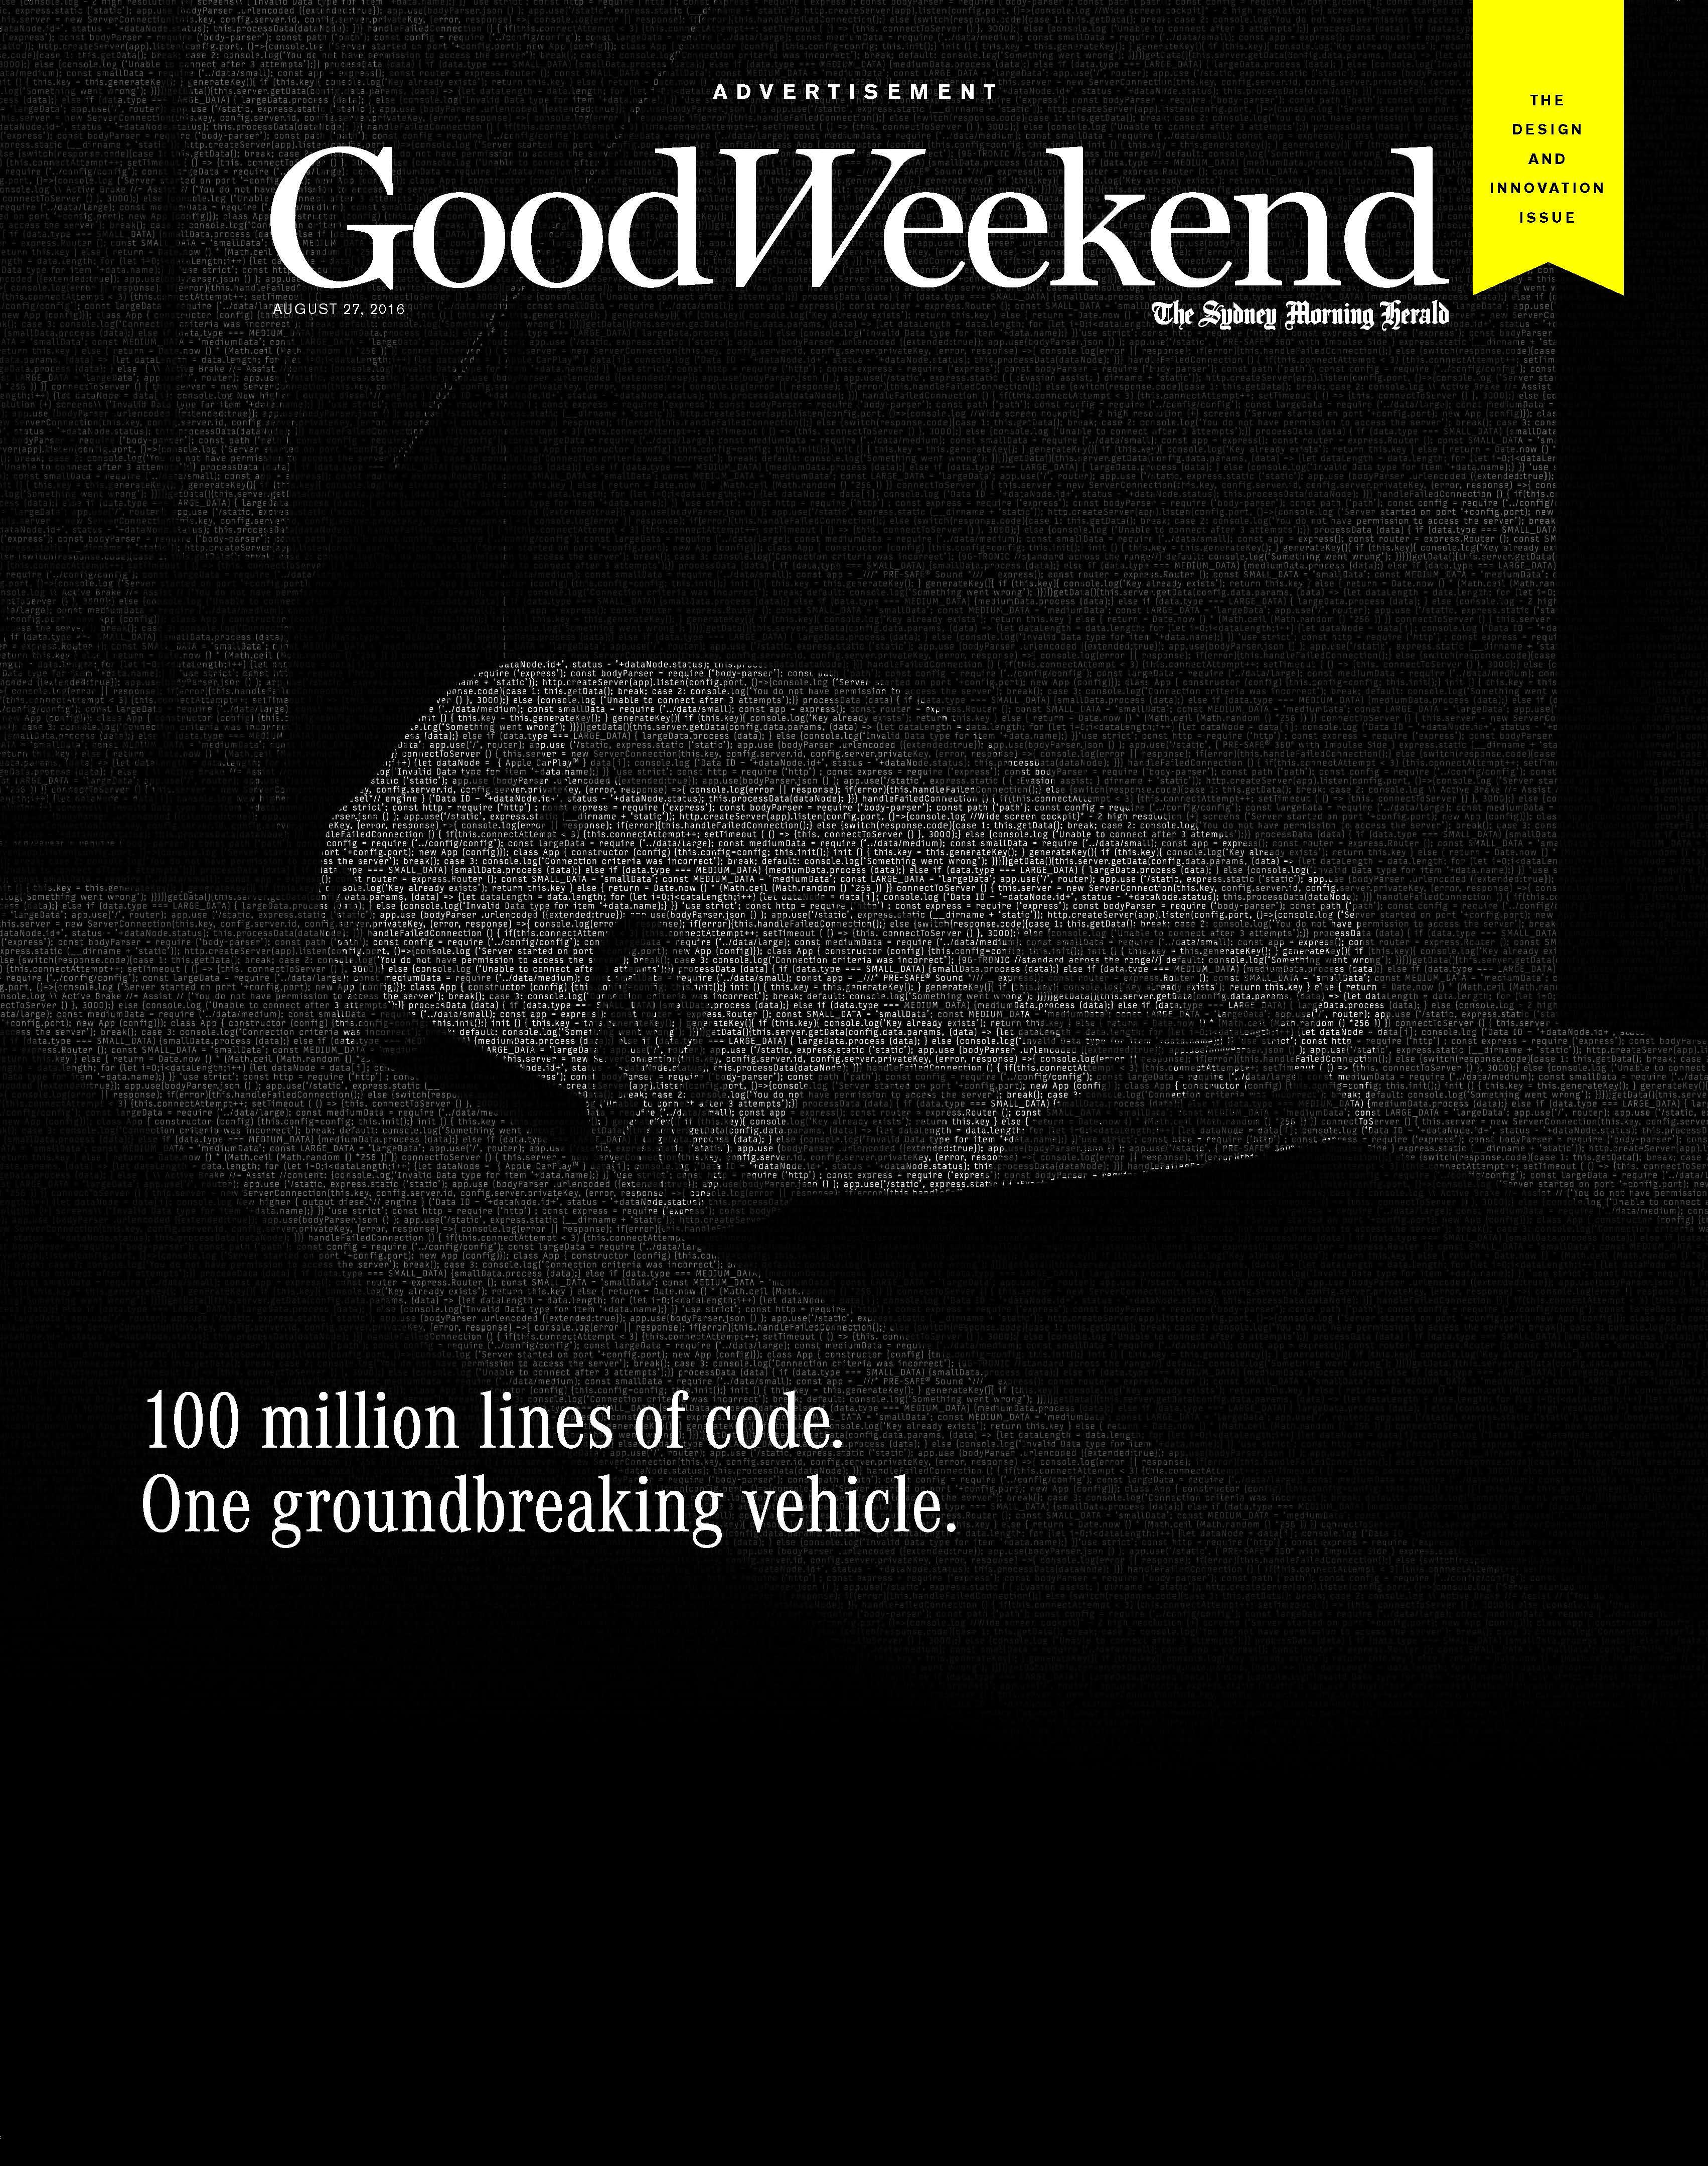 Good Weekend Design and Innovation - Mercedes-Benz